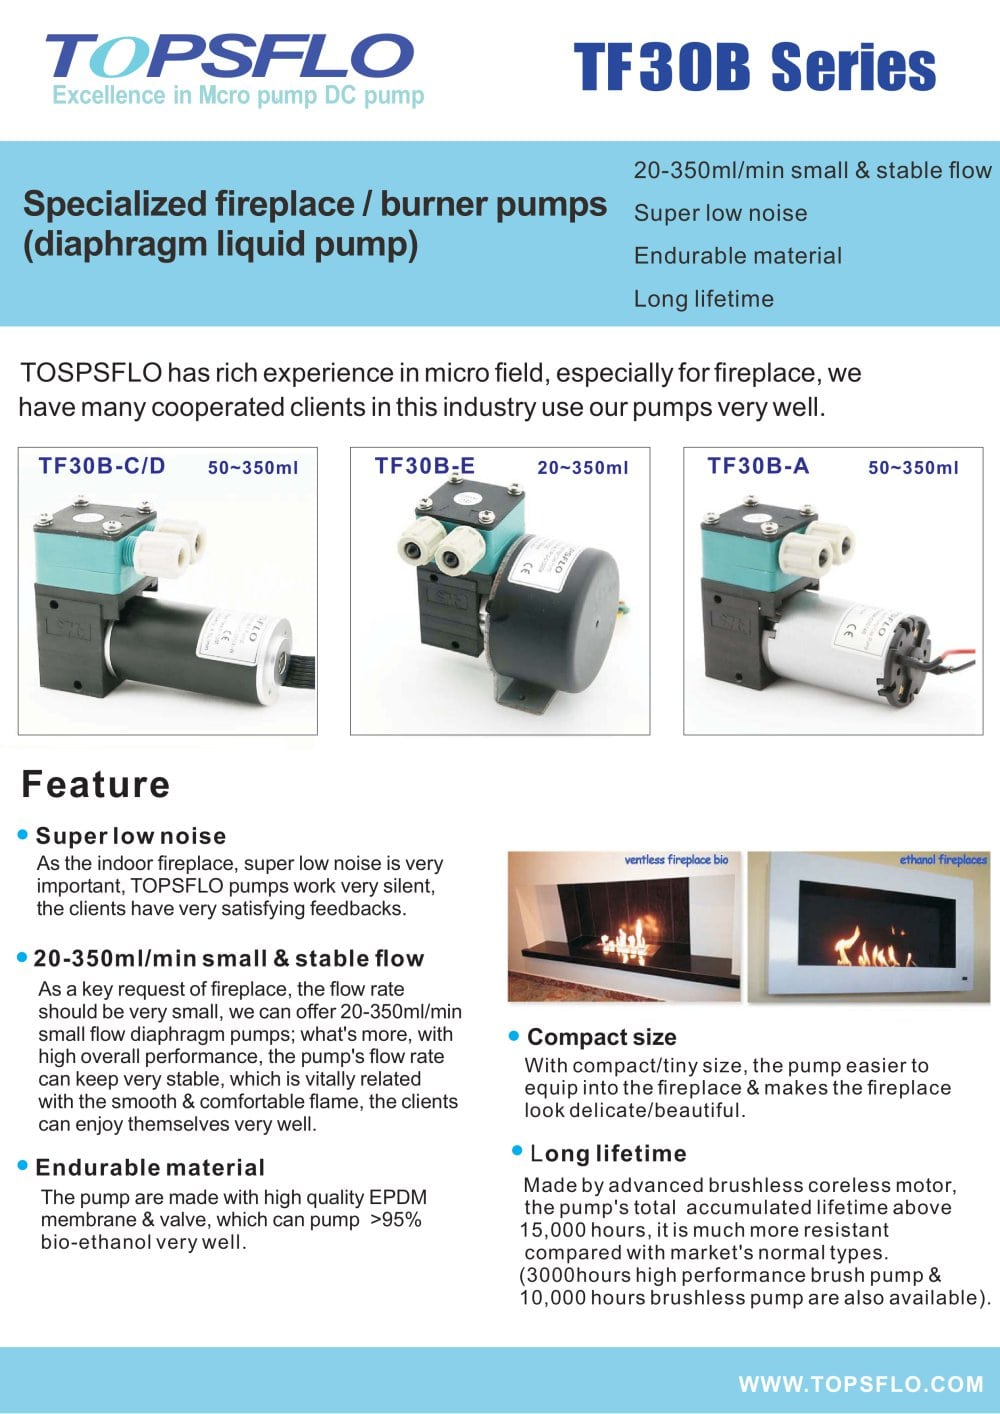 TOPSFLO Diaphragm fireplace PUMP burner pumps - TOPSFLO INDUSTRY ...